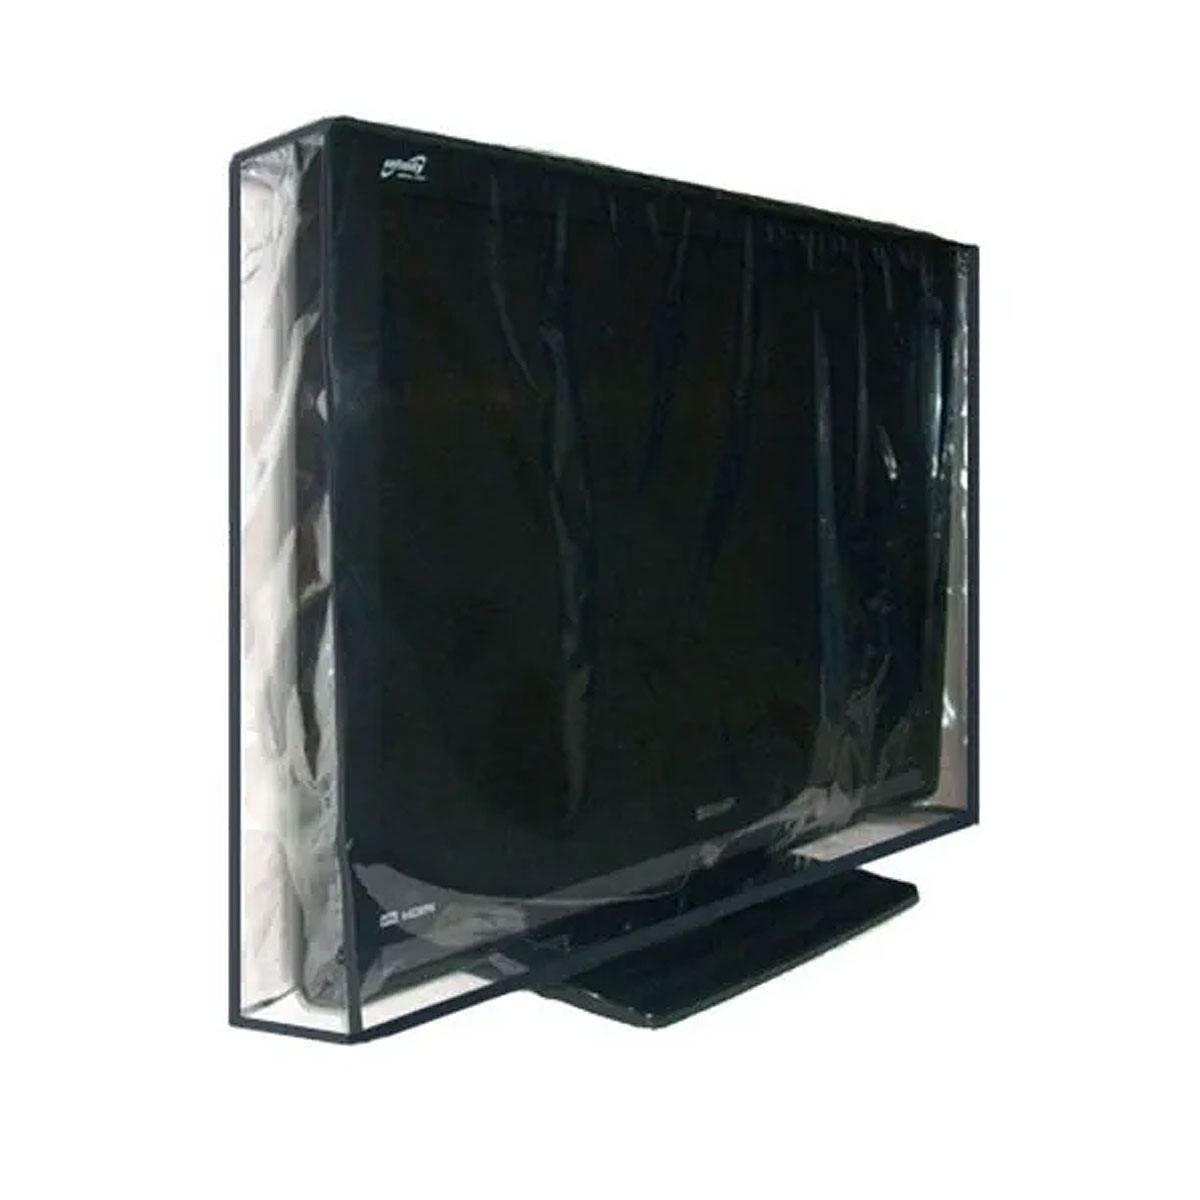 Capa Para Tv Lcd 52 Pvc Cristal - Aberta P/ Suporte